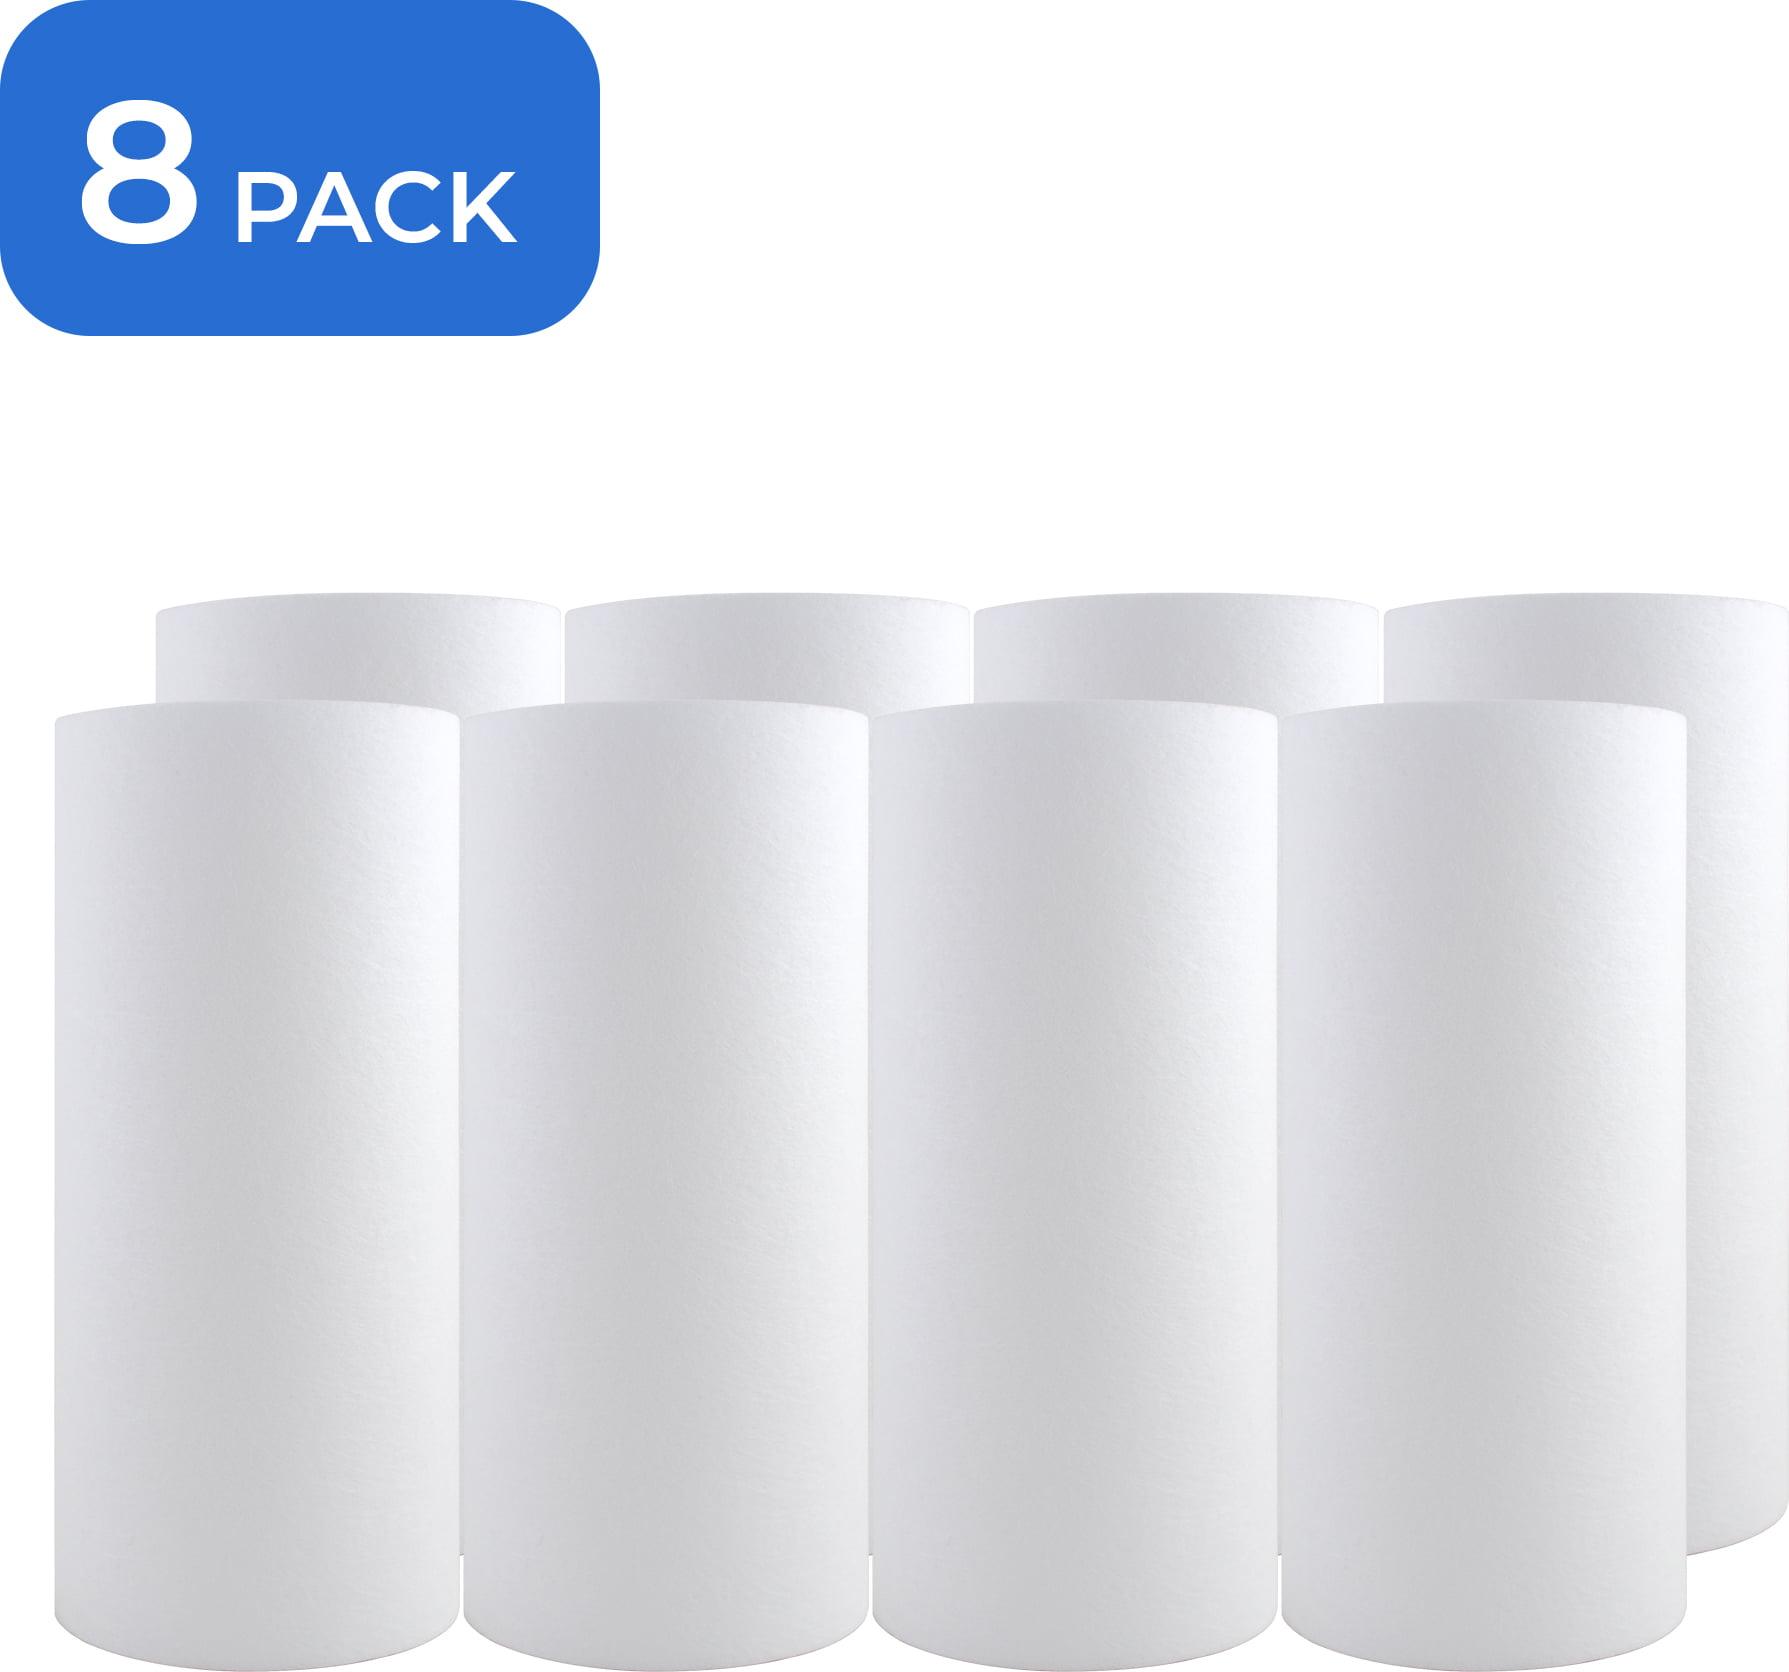 10 x 4.5 DGD-2501 155359-43 Package Of 3 Pentek DGD-2501 Sediment Water Filters